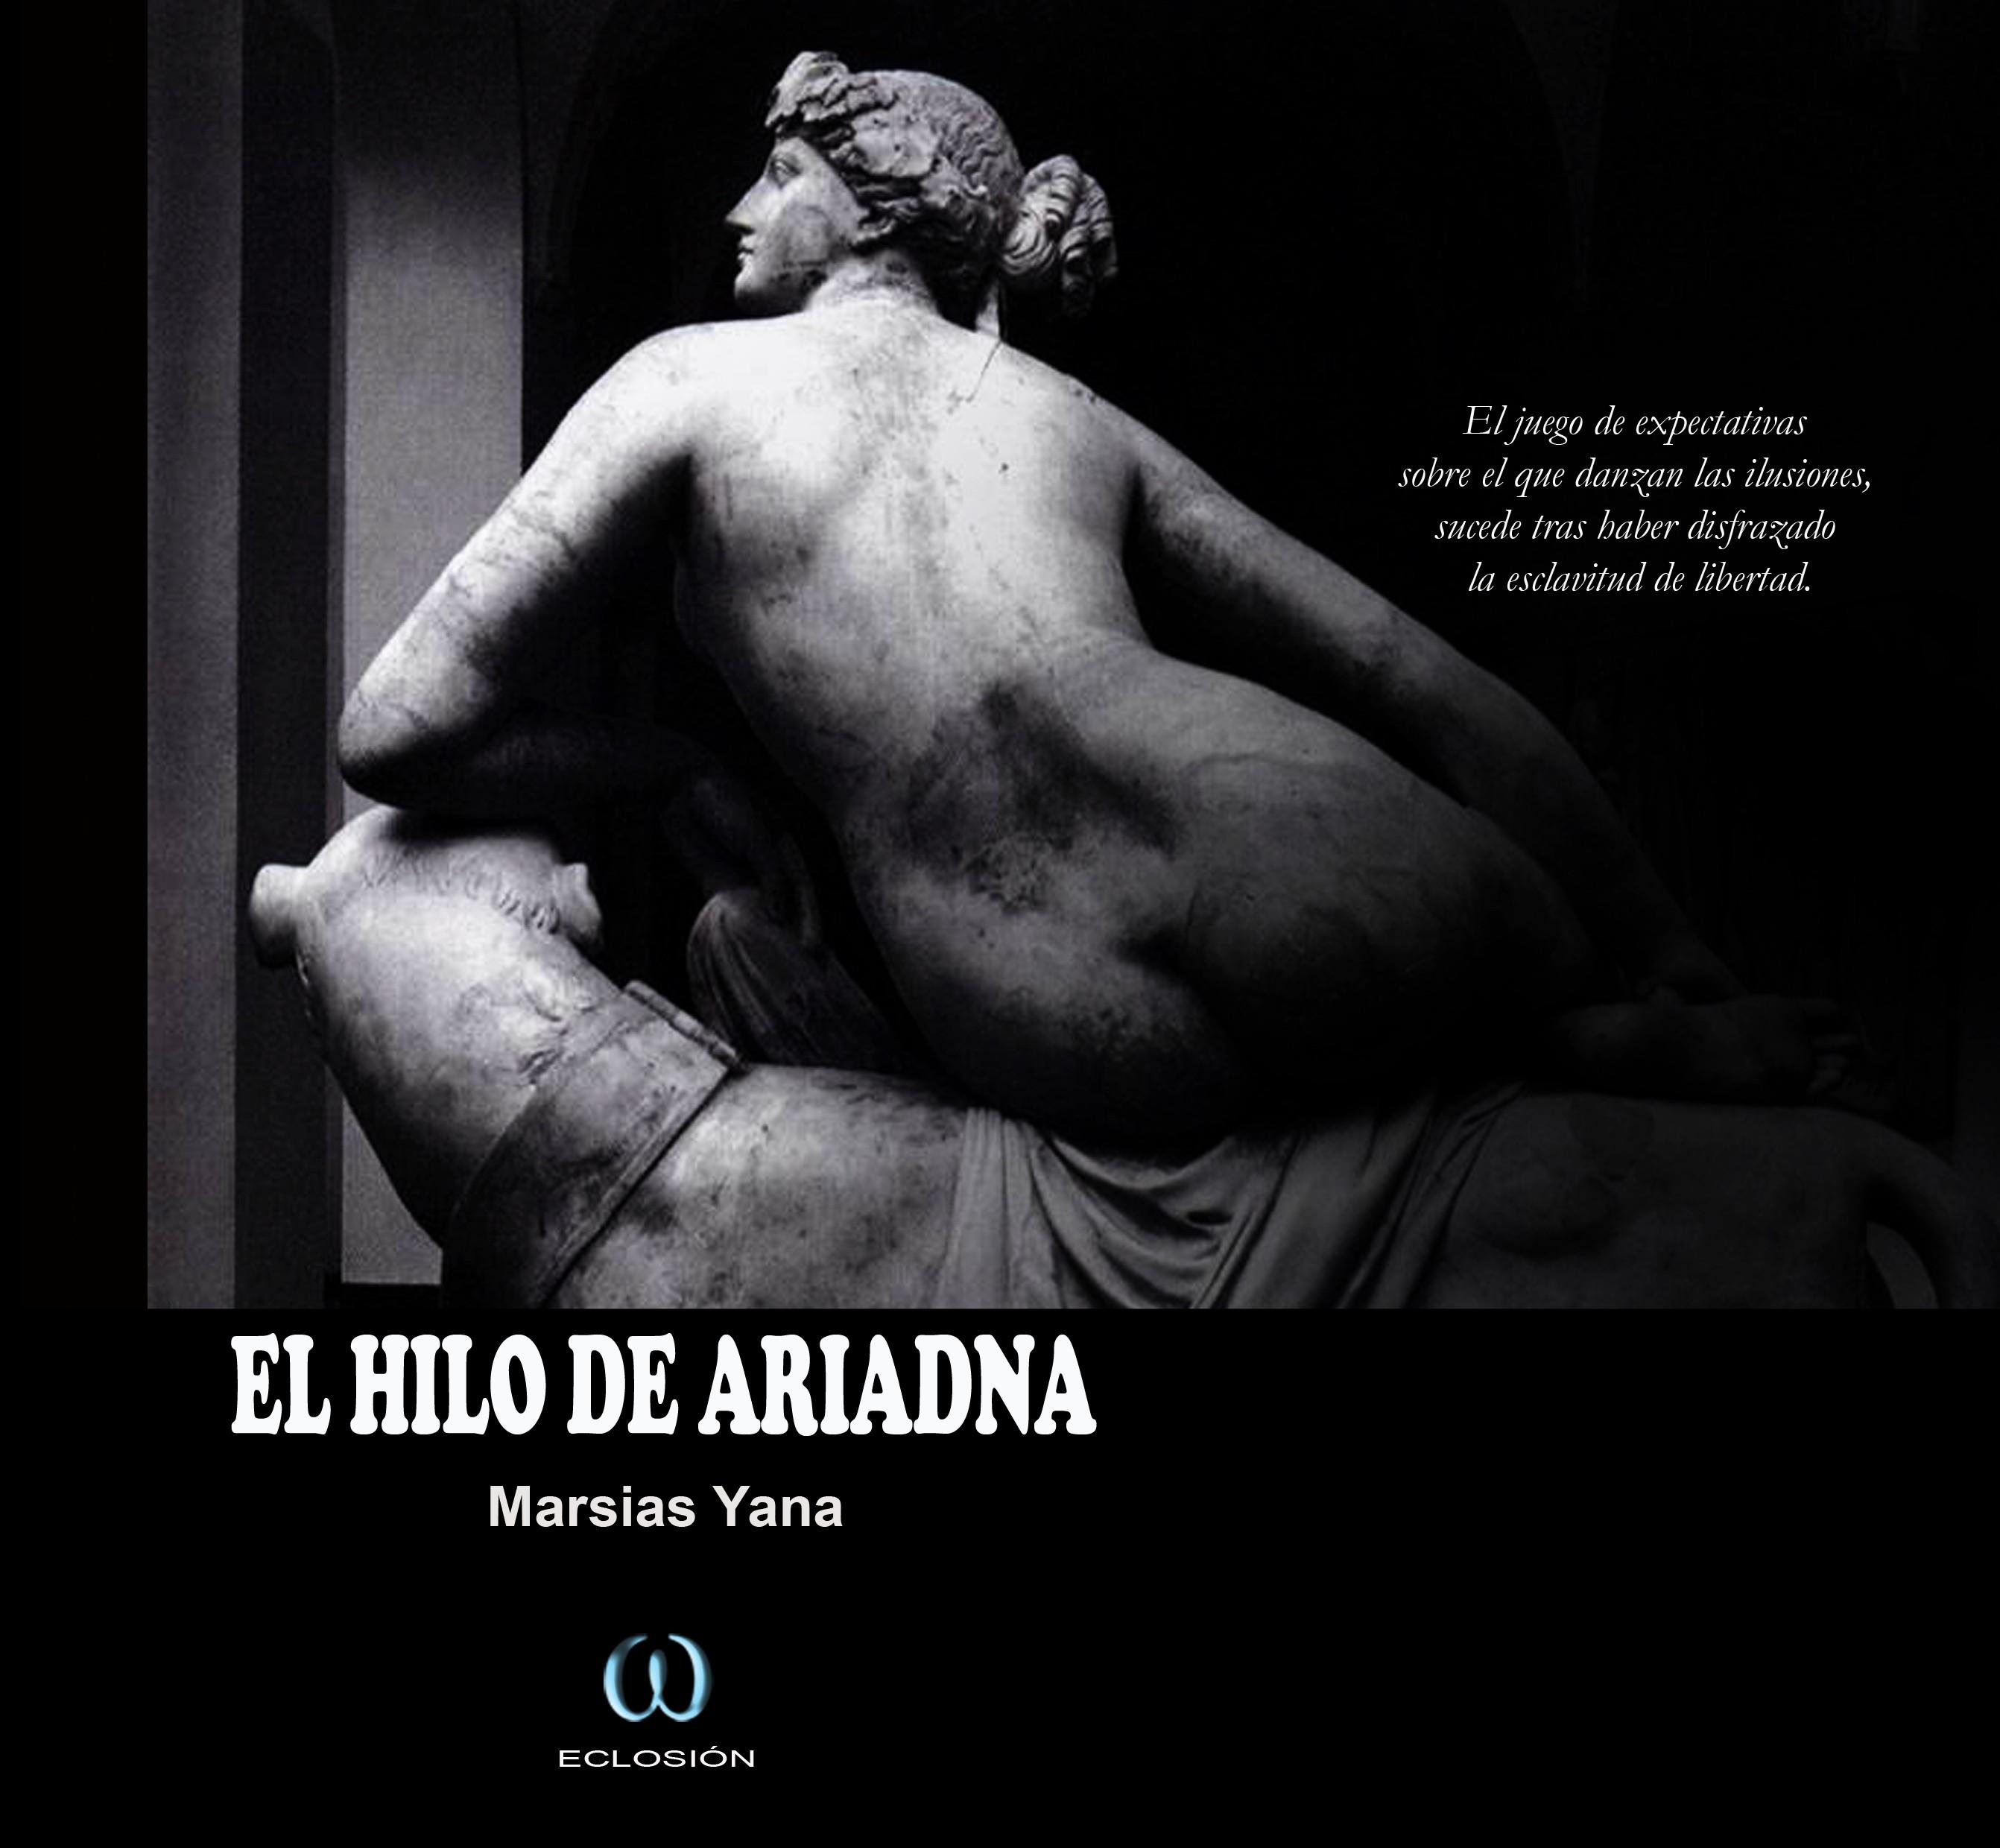 El hilo de Ariadna PORTADA - El Hilo de Ariadna